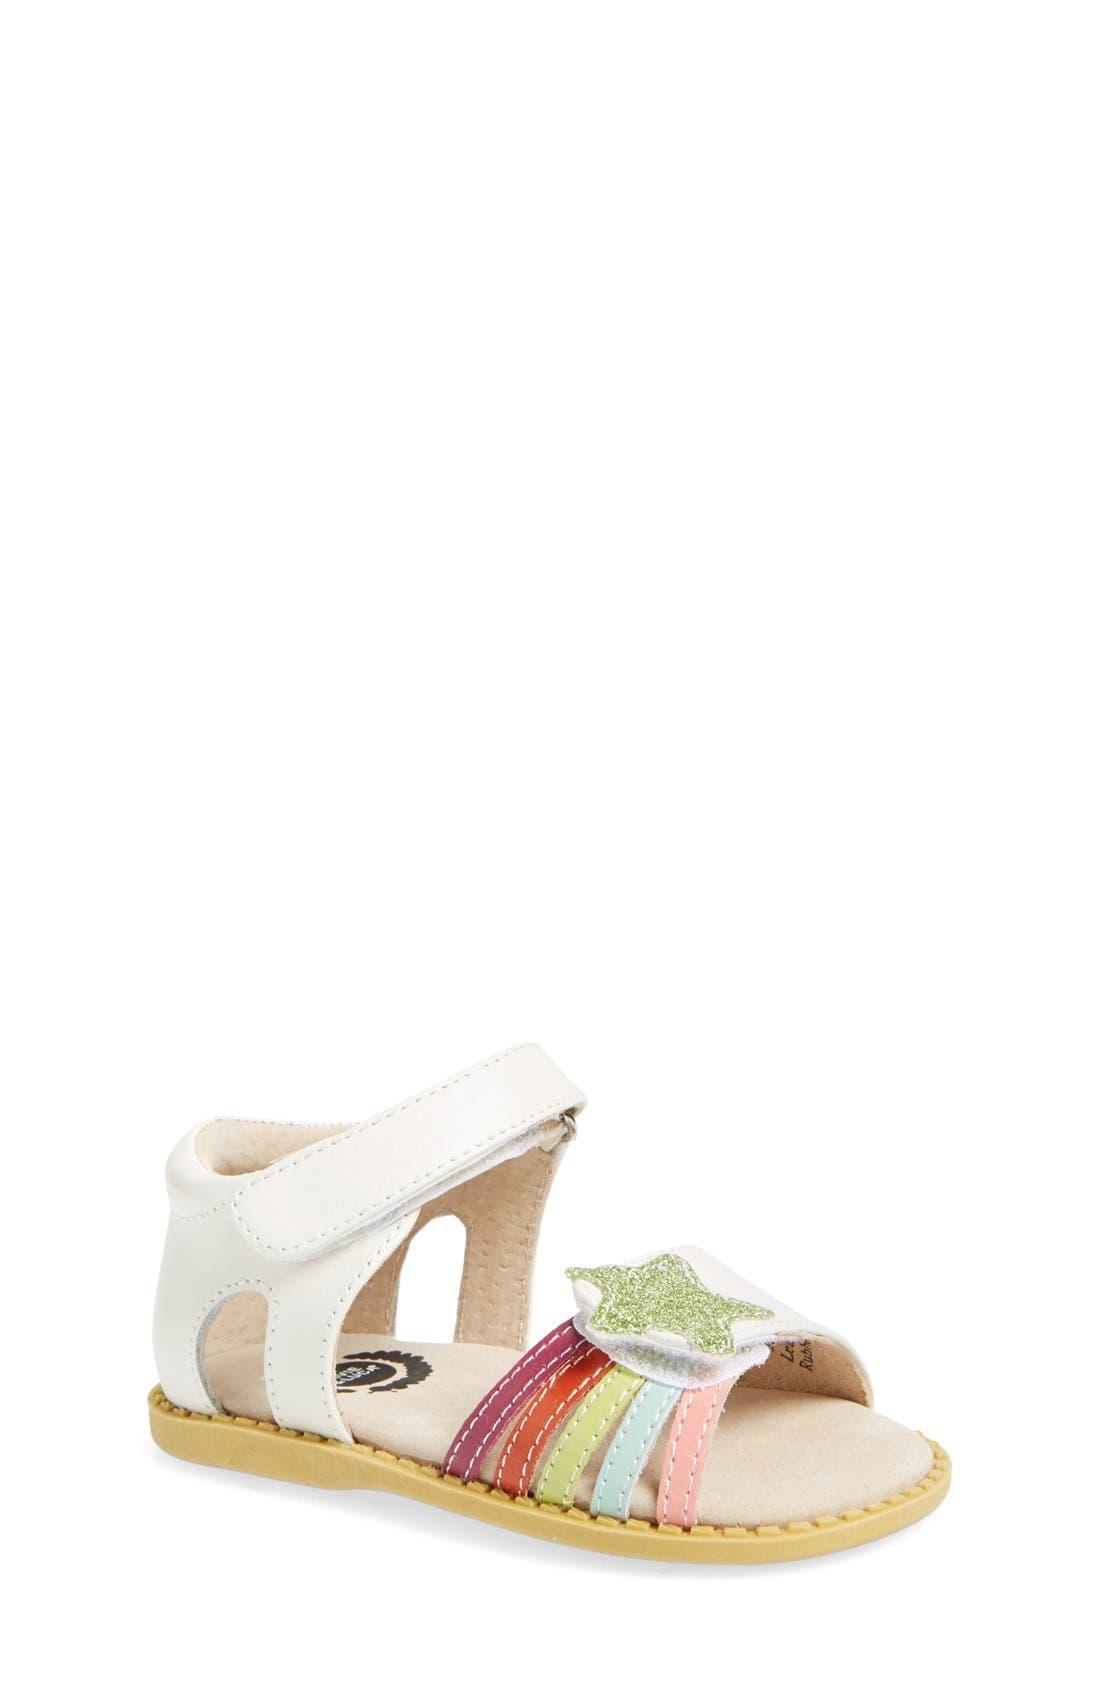 'Nova' Sandal,                         Main,                         color, MILK LEATHER